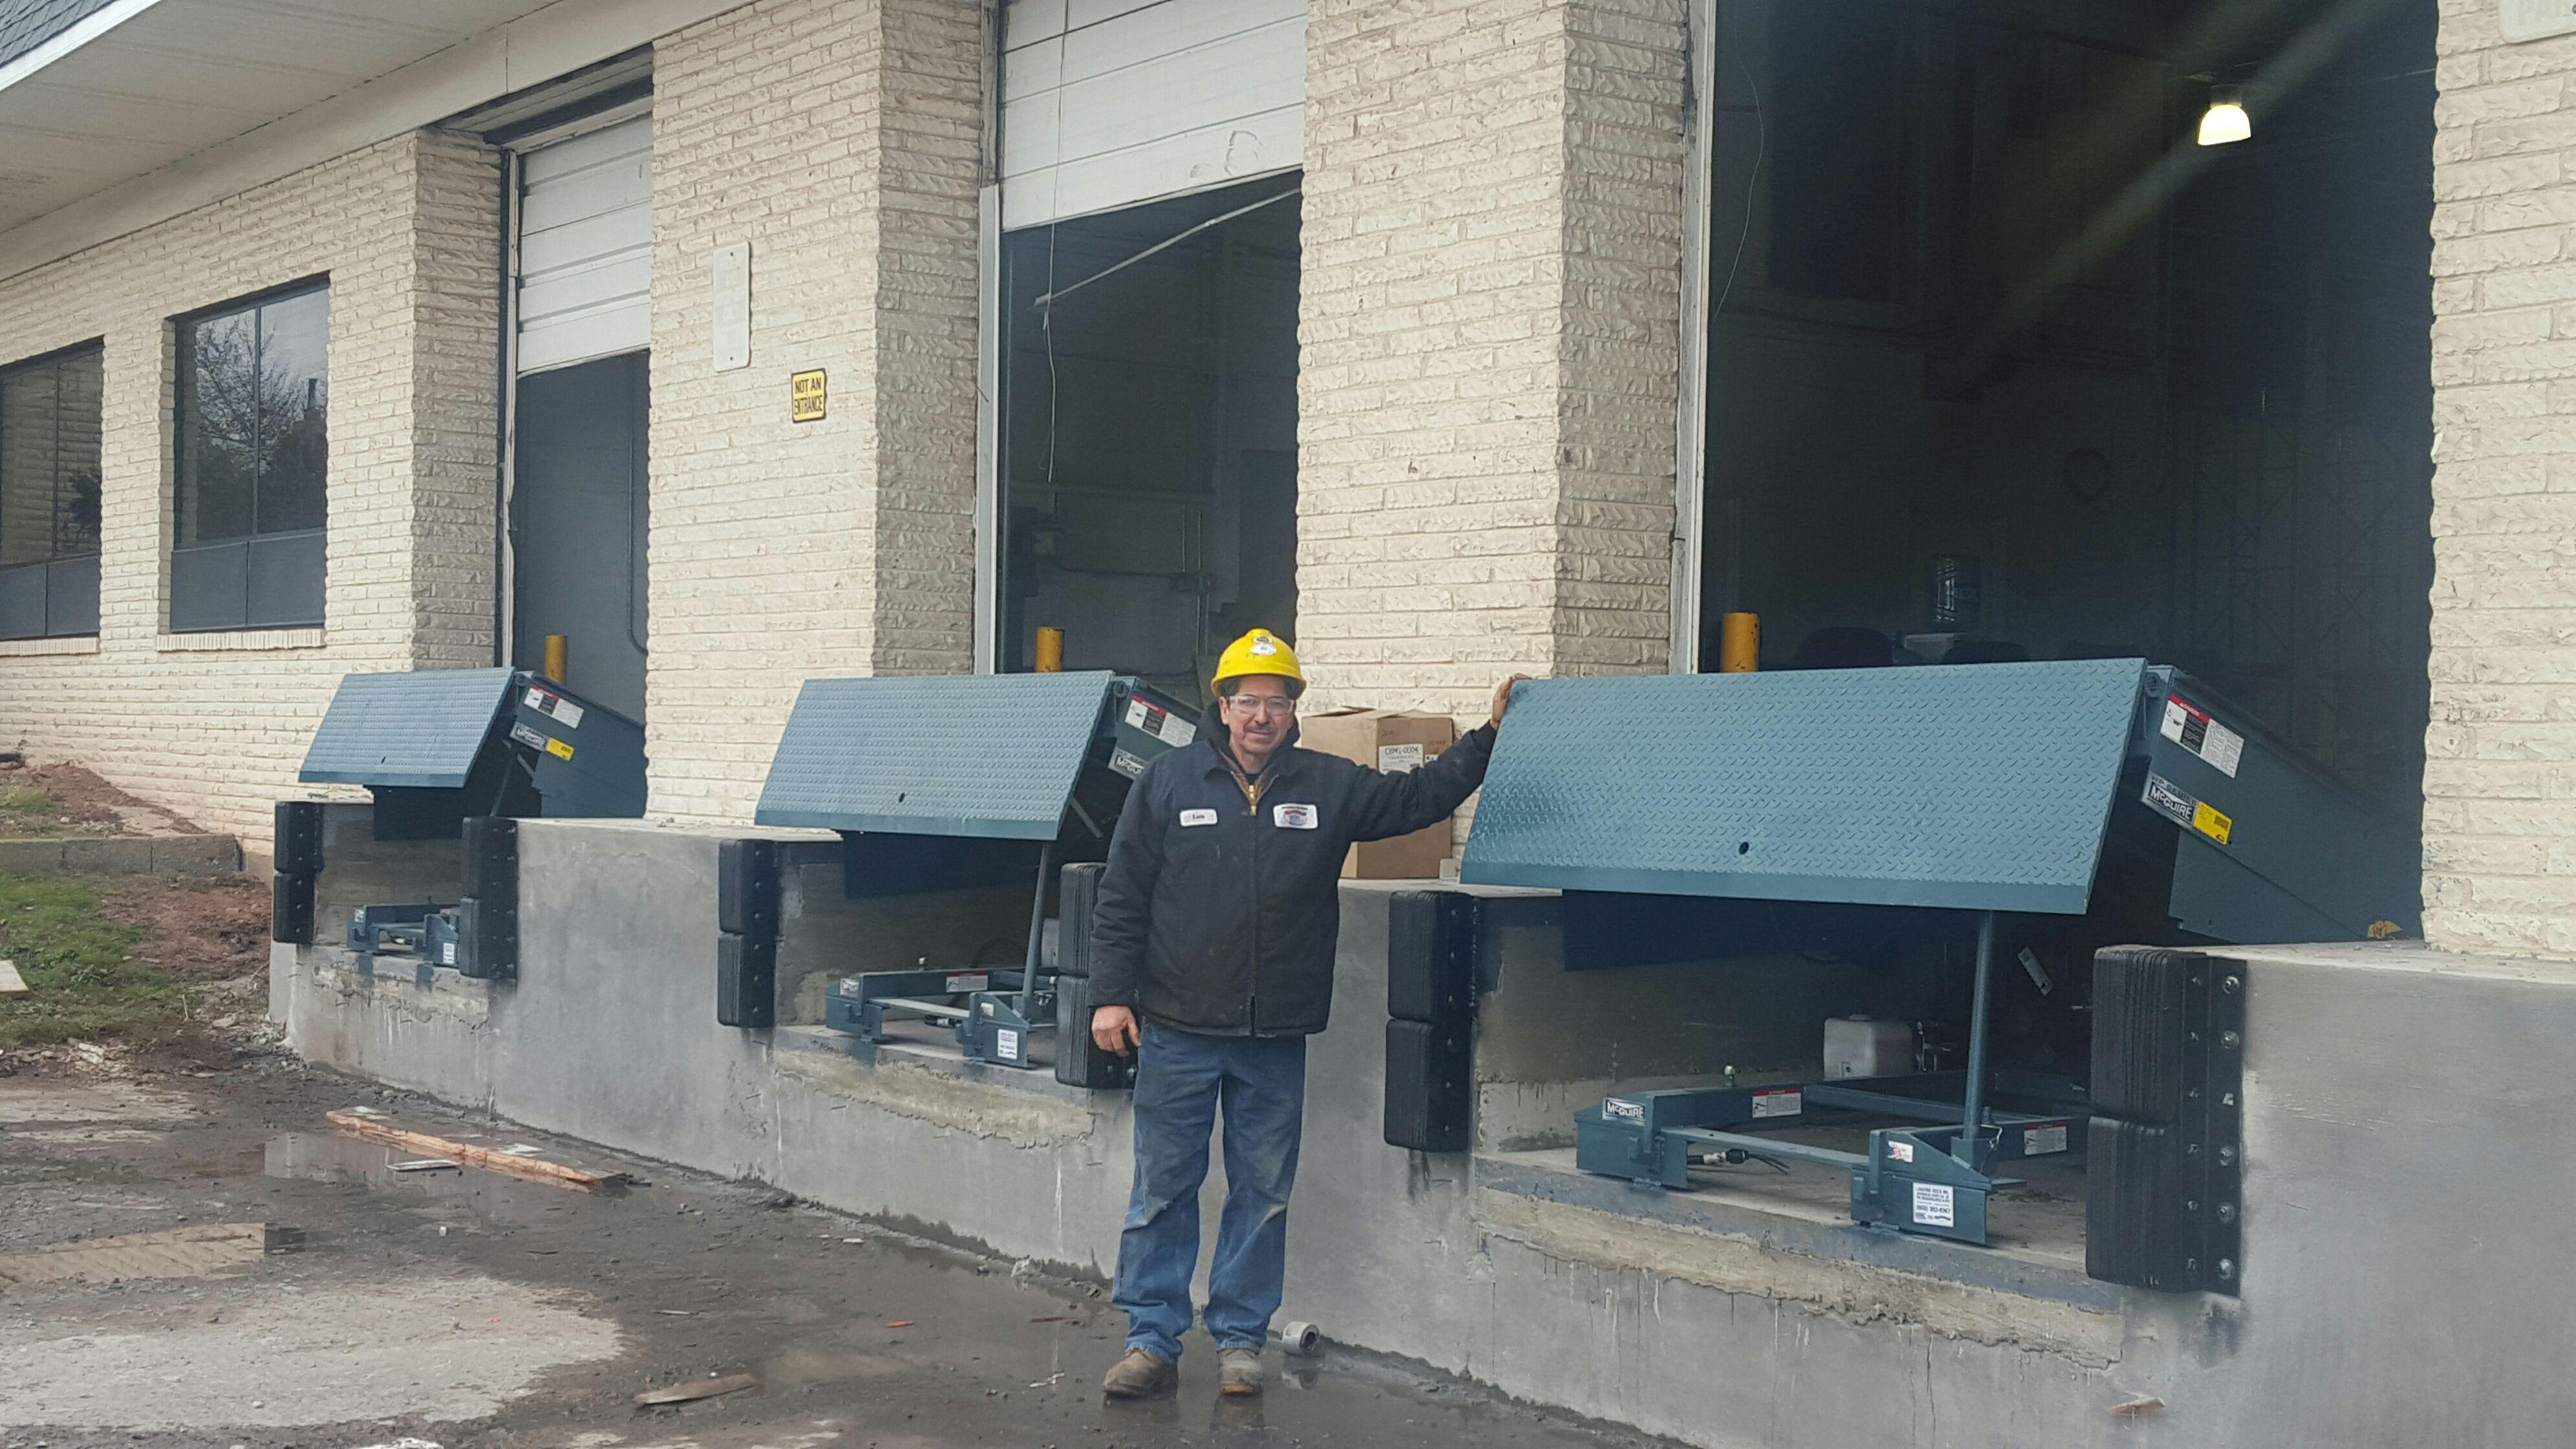 Dock_Plate_Lift_Service_New_Jersey_New_York_City.jpg & Loading Dock Repairs - NJ \u0026 NYC: PowerAmp Pentalift McGuire ...